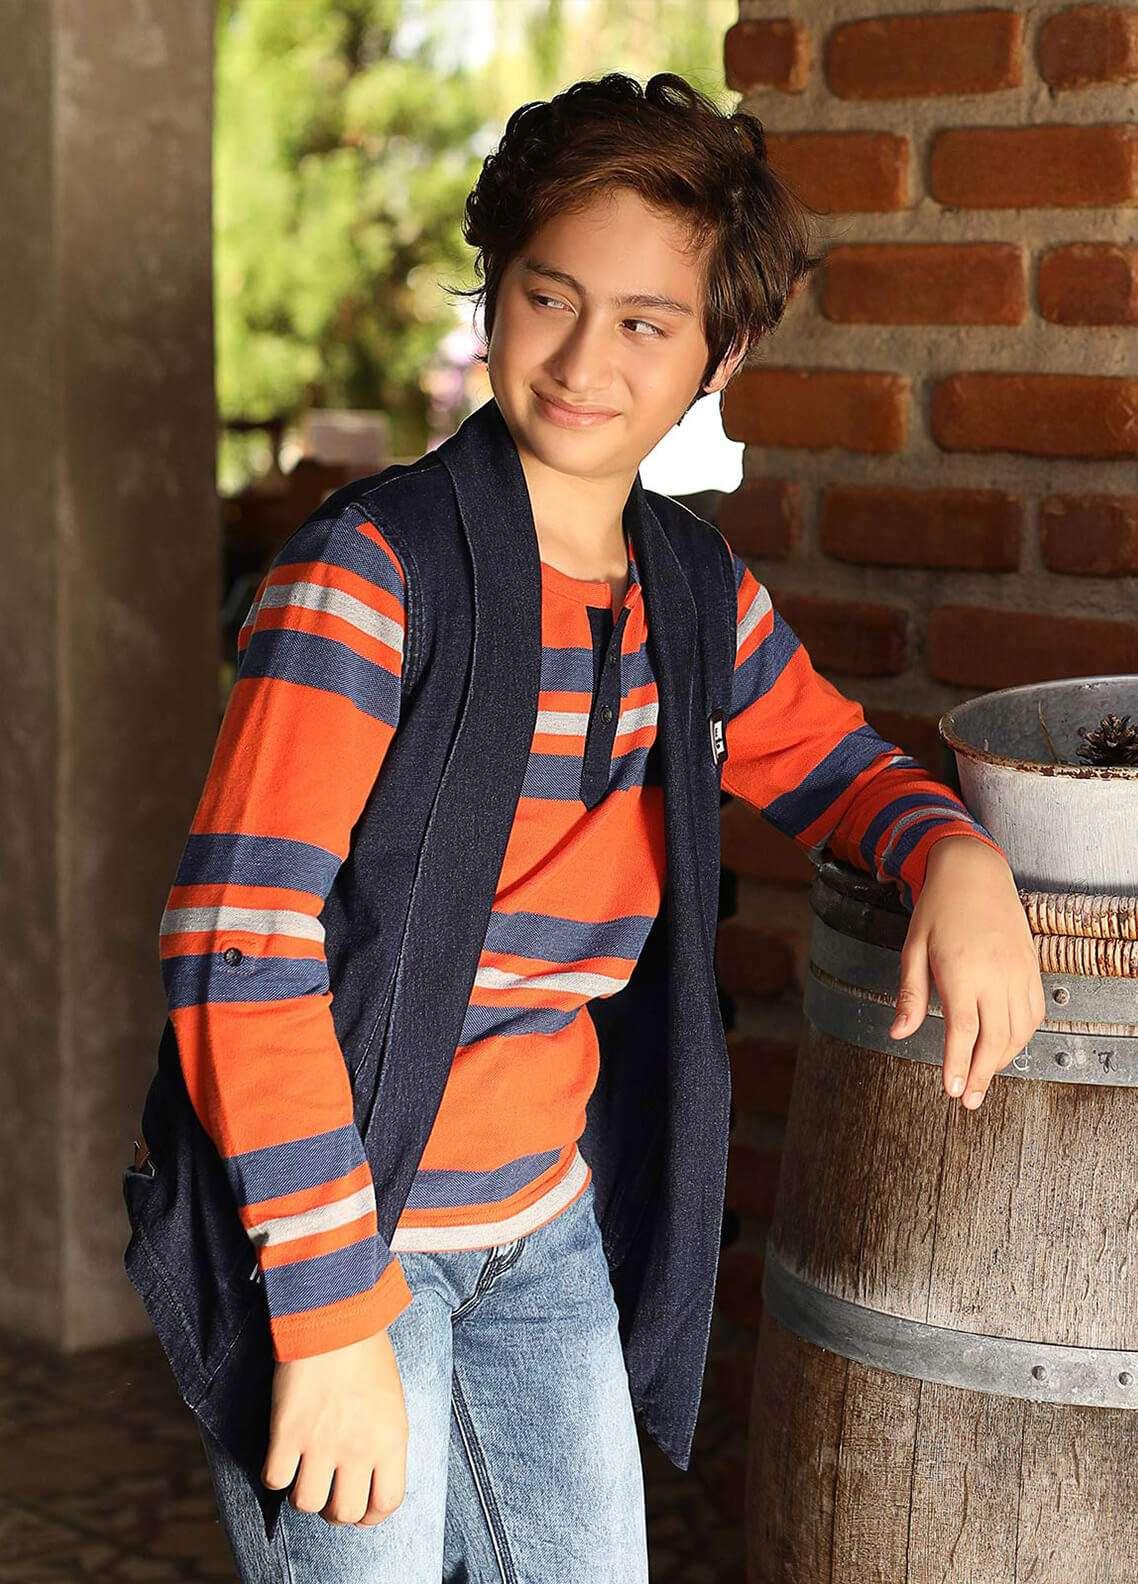 Edenrobe Cotton Casual Shirts for Boys - Navy Blue 014358